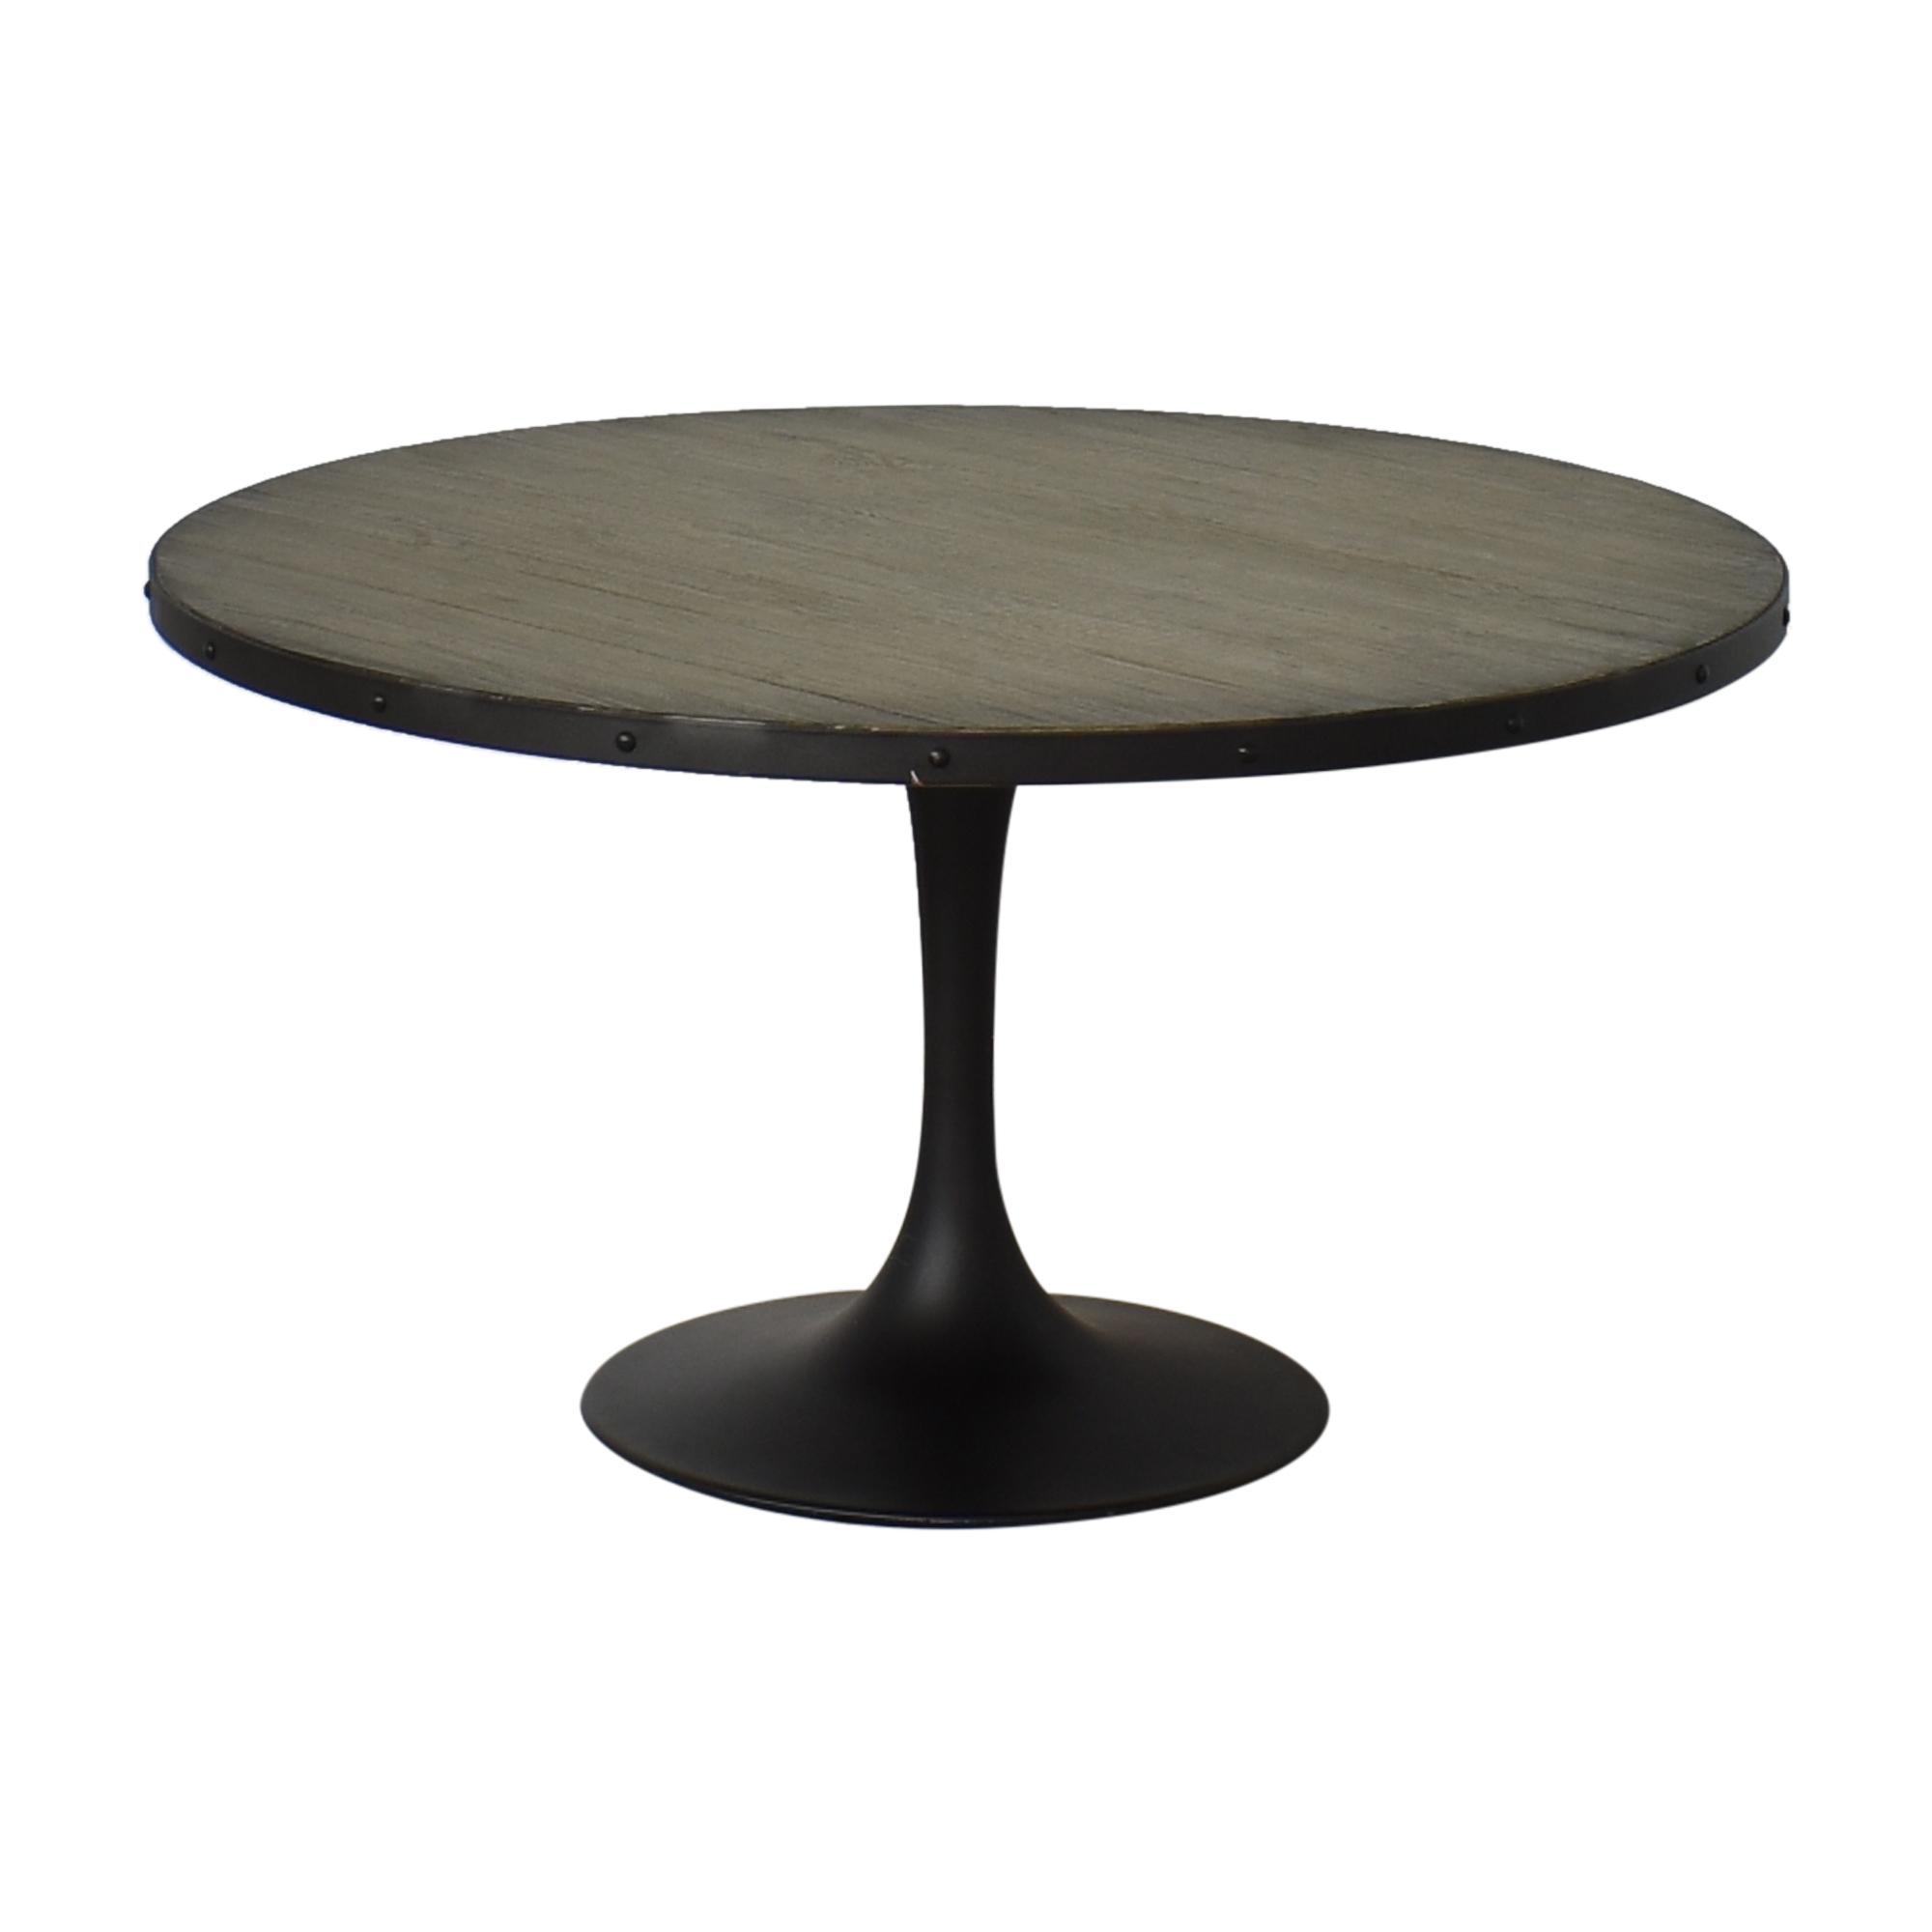 Arhaus Arhaus Kenton Dining Table dimensions